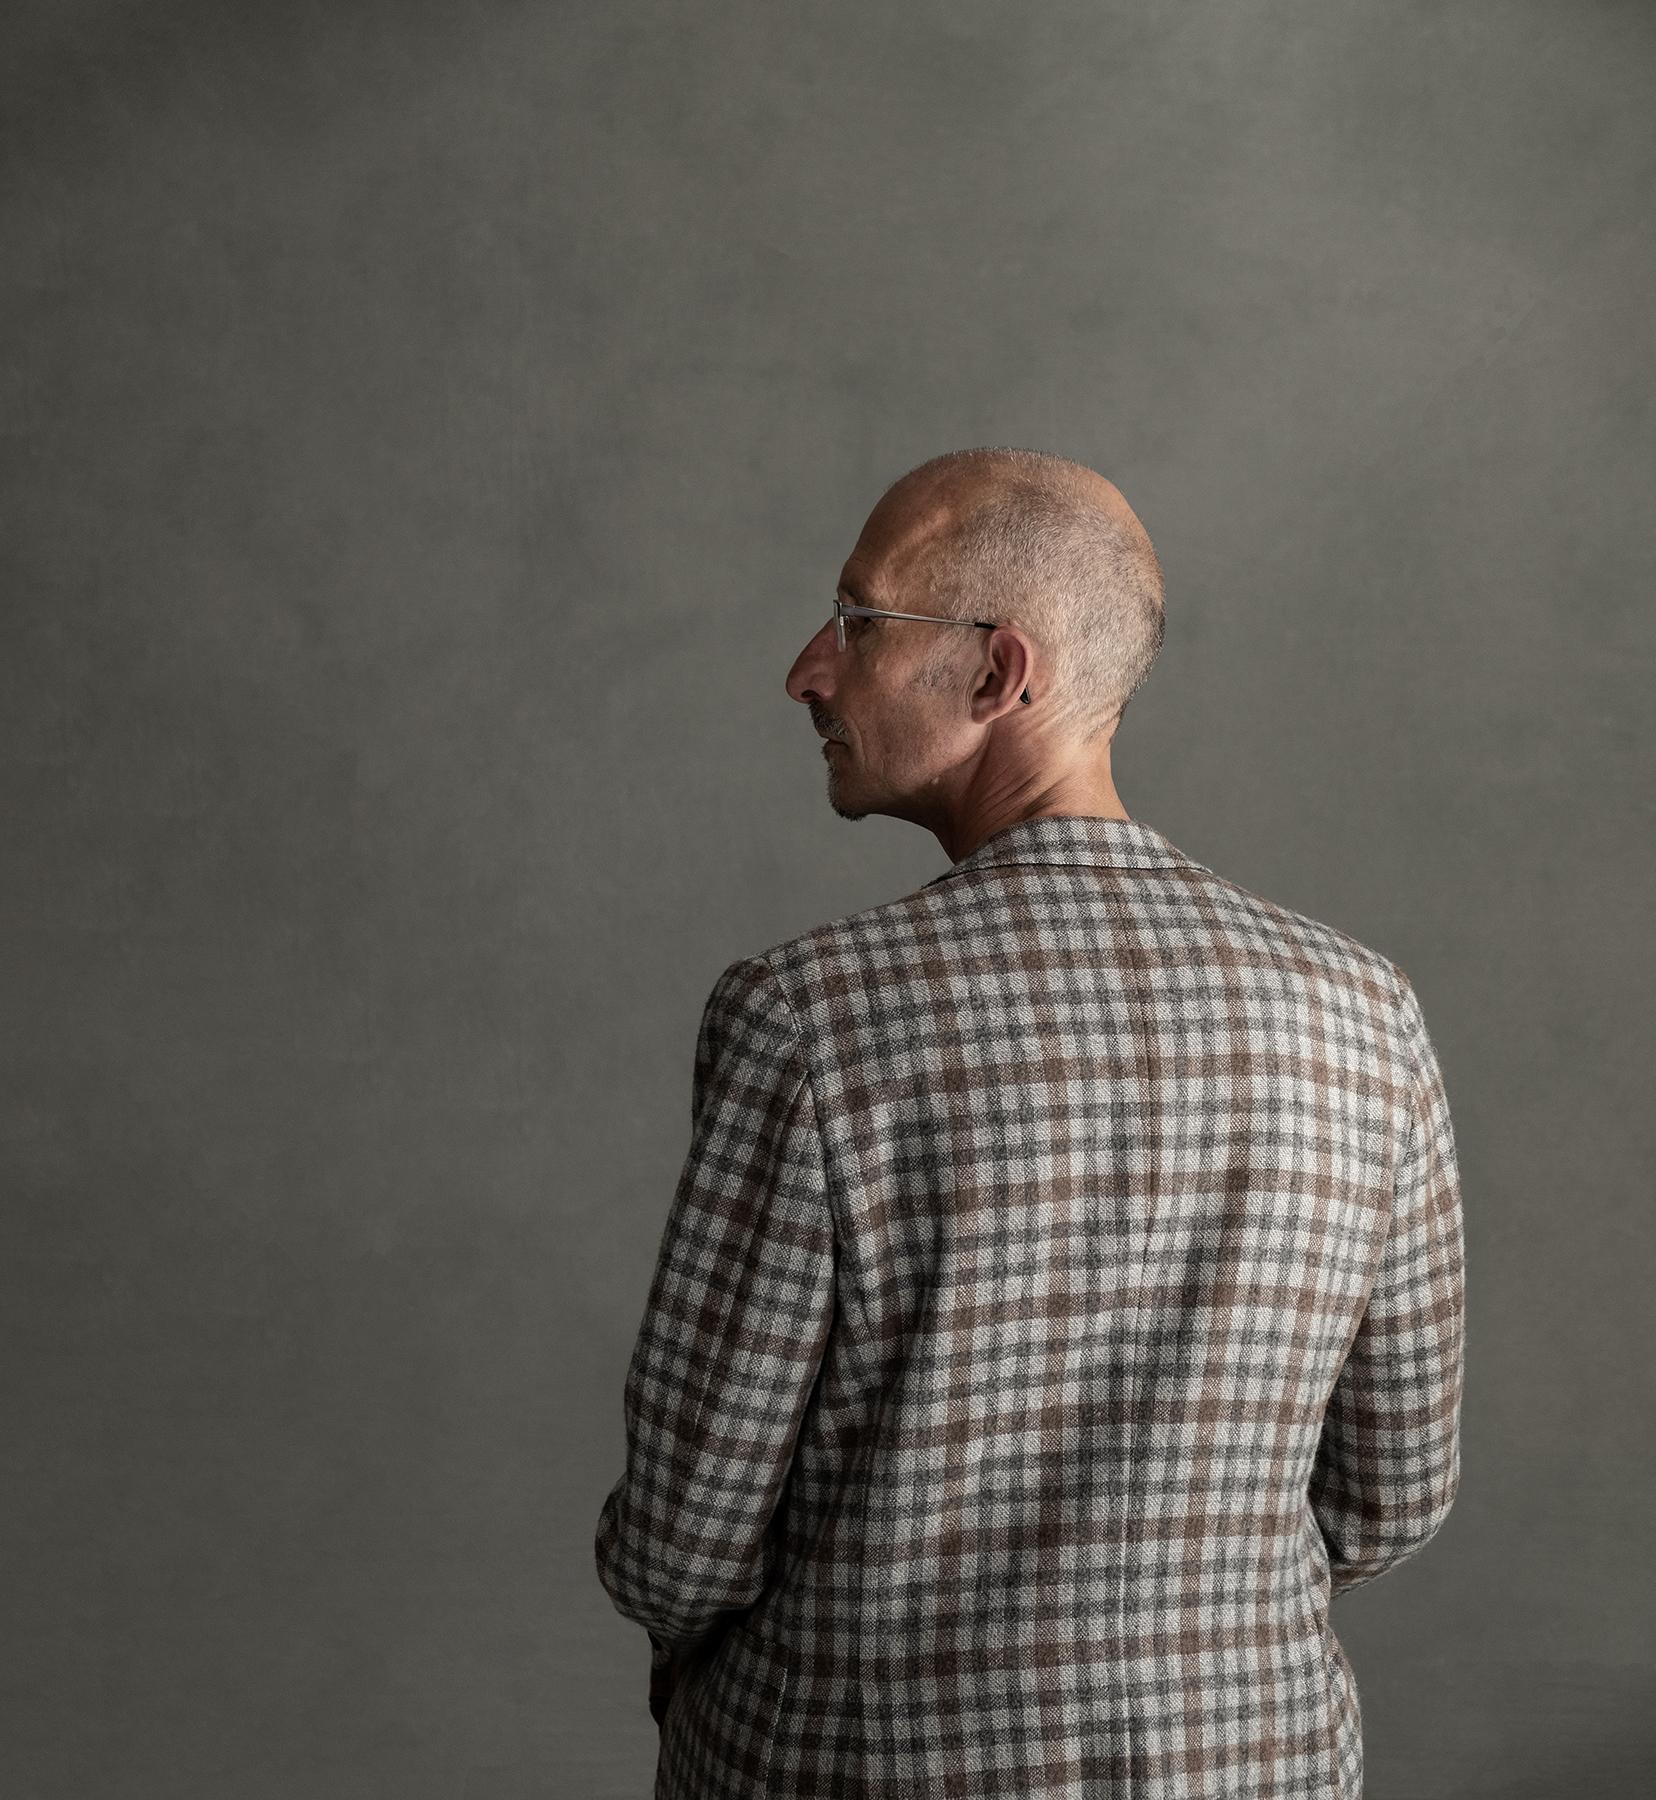 portret, portrait, portretfptpgrafie, portraitphotography, Susanne Middelberg